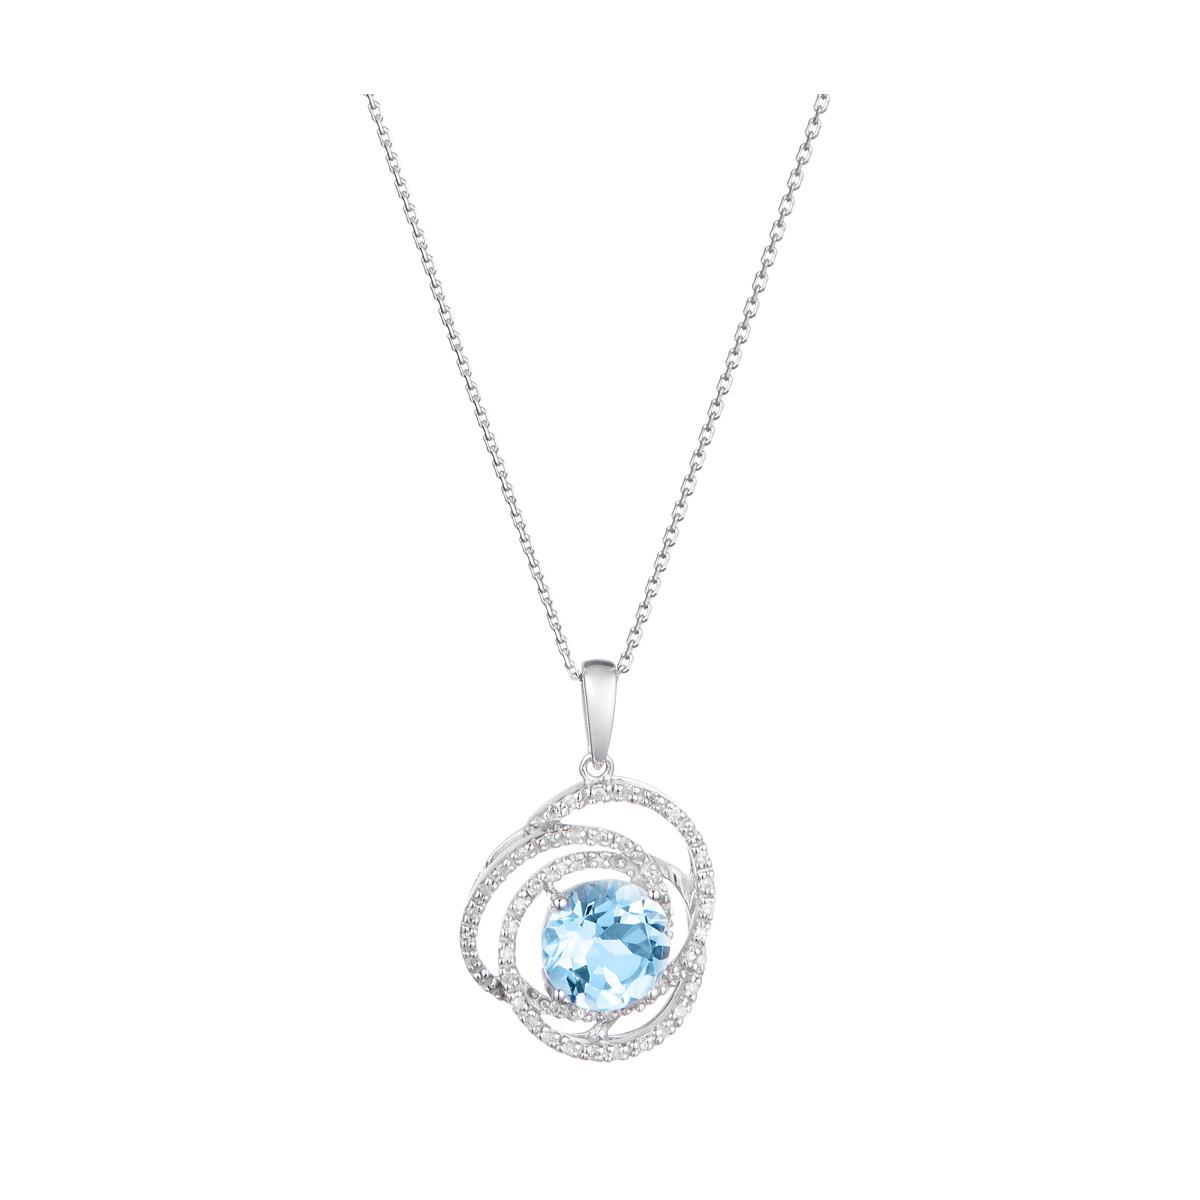 "Pendentif Or Blanc ""SEYCHELLES"" Diamants 0,17 carat et Topaze 2,25 carat"